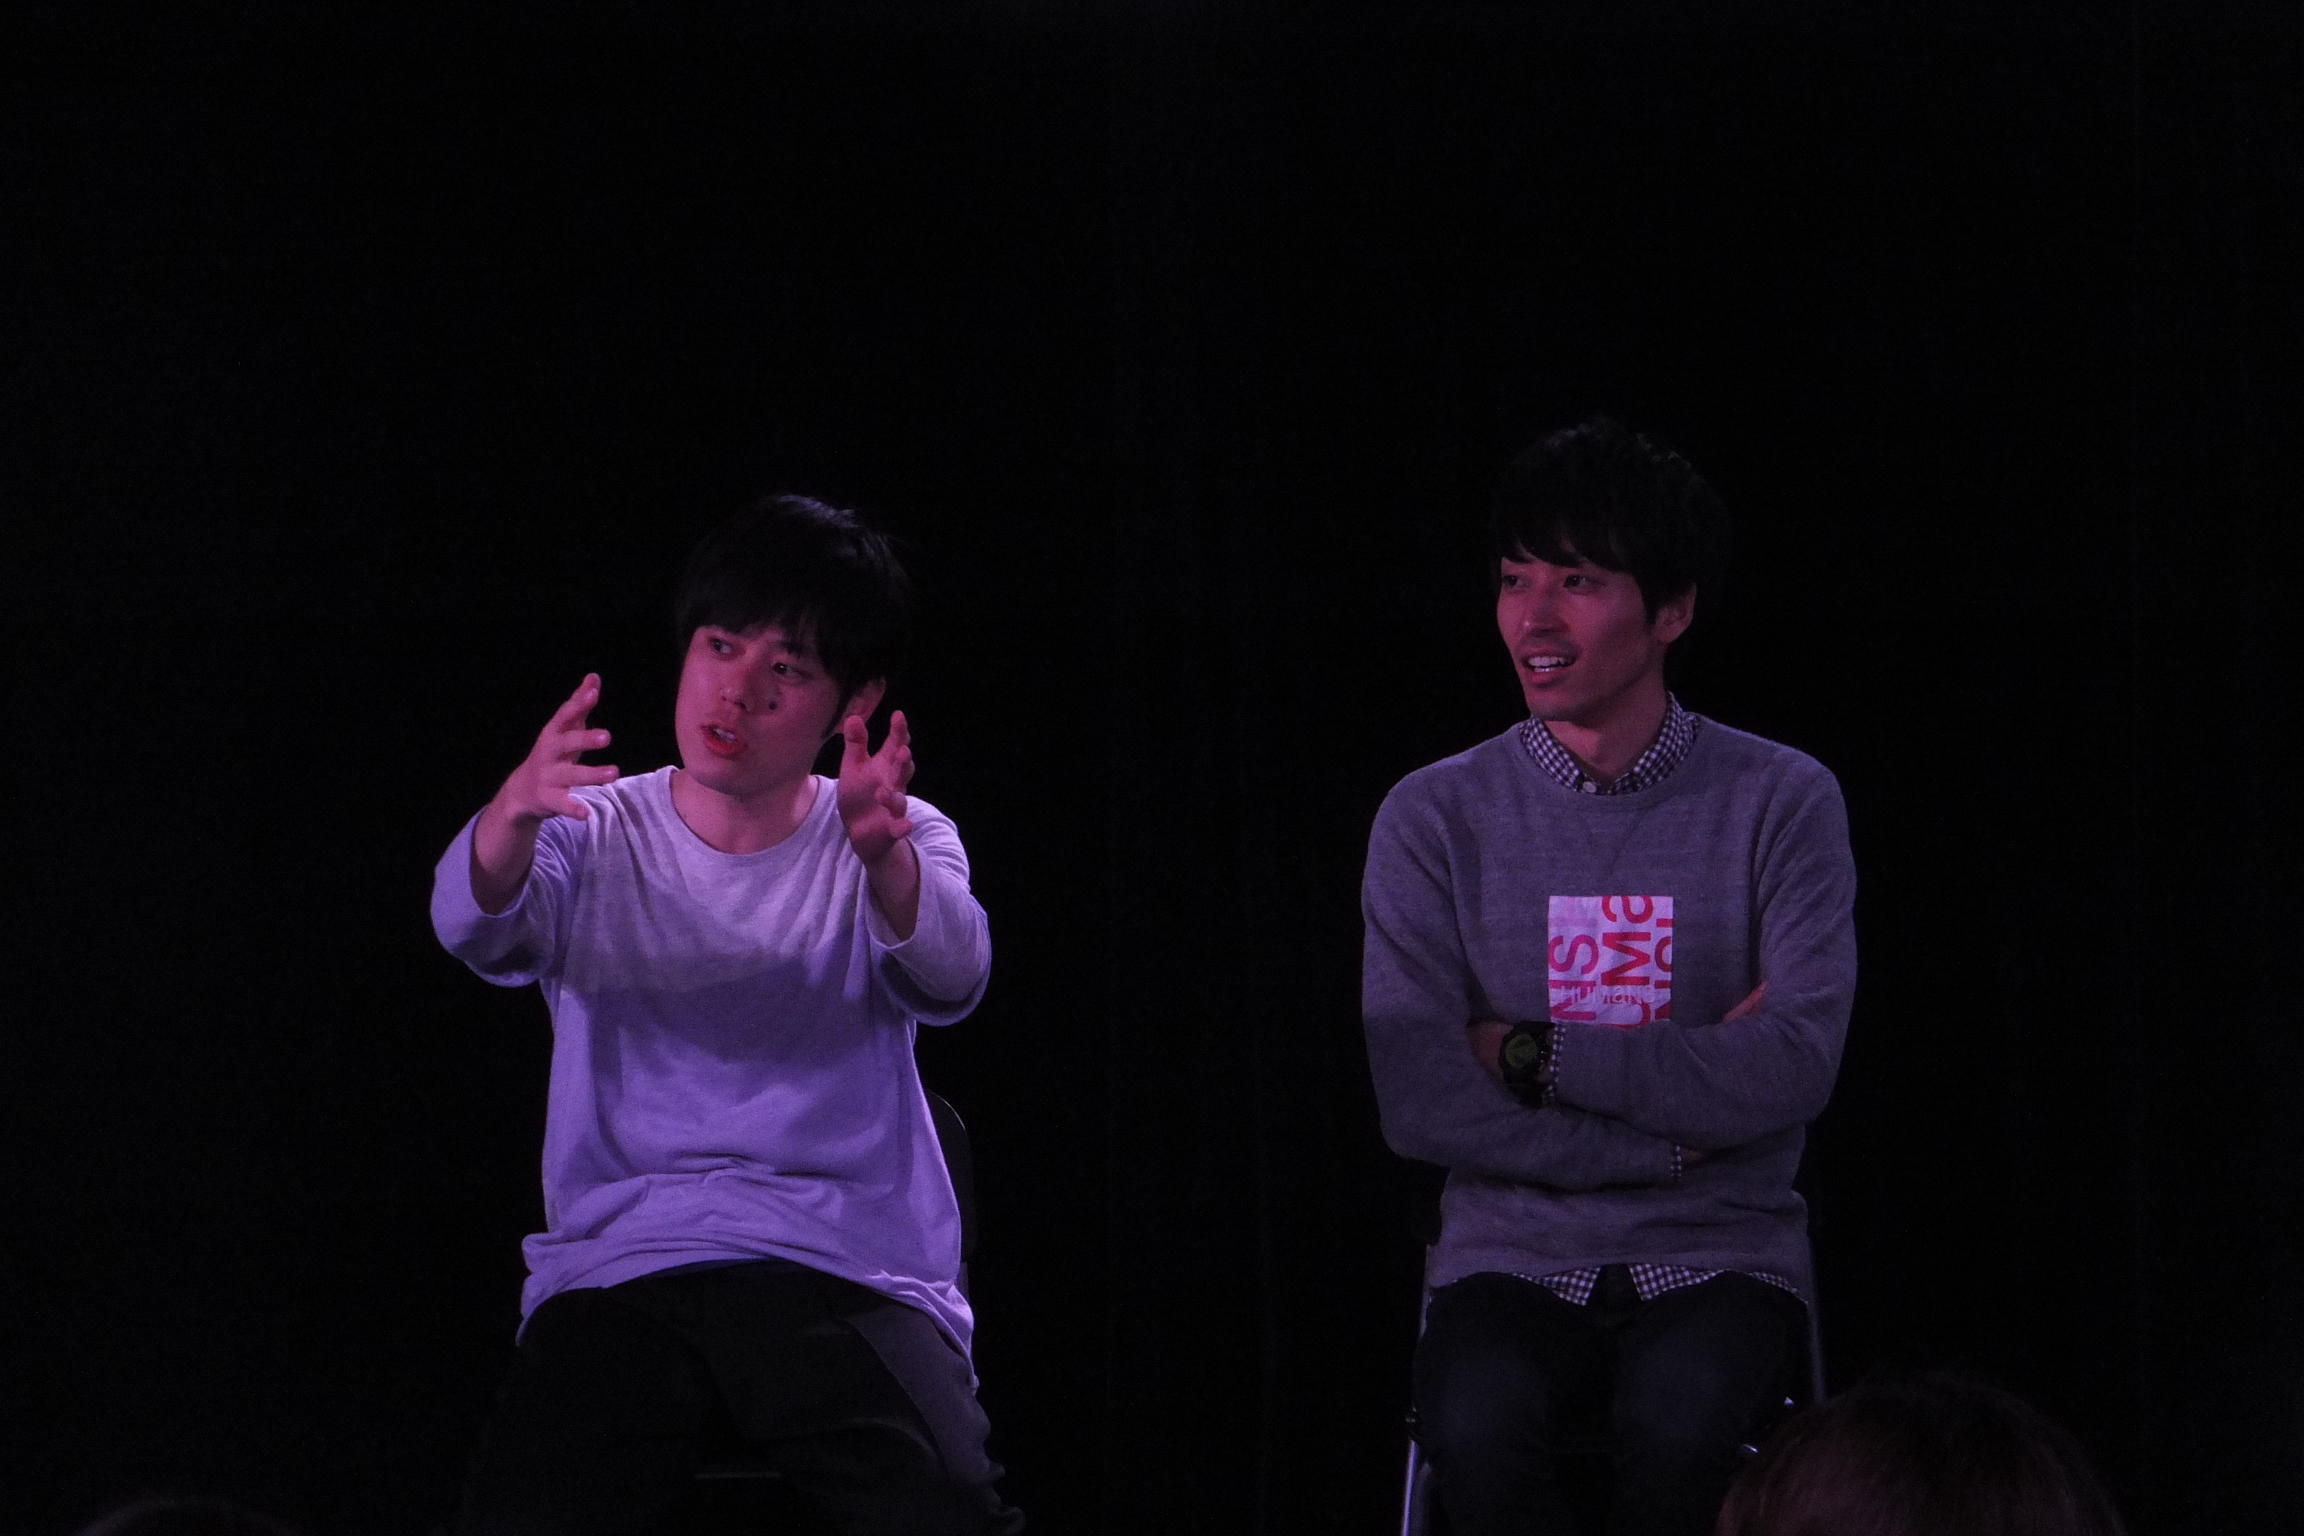 http://news.yoshimoto.co.jp/20151130175531-0452f146b368c26bff98920a7aca67742b5825f8.jpg